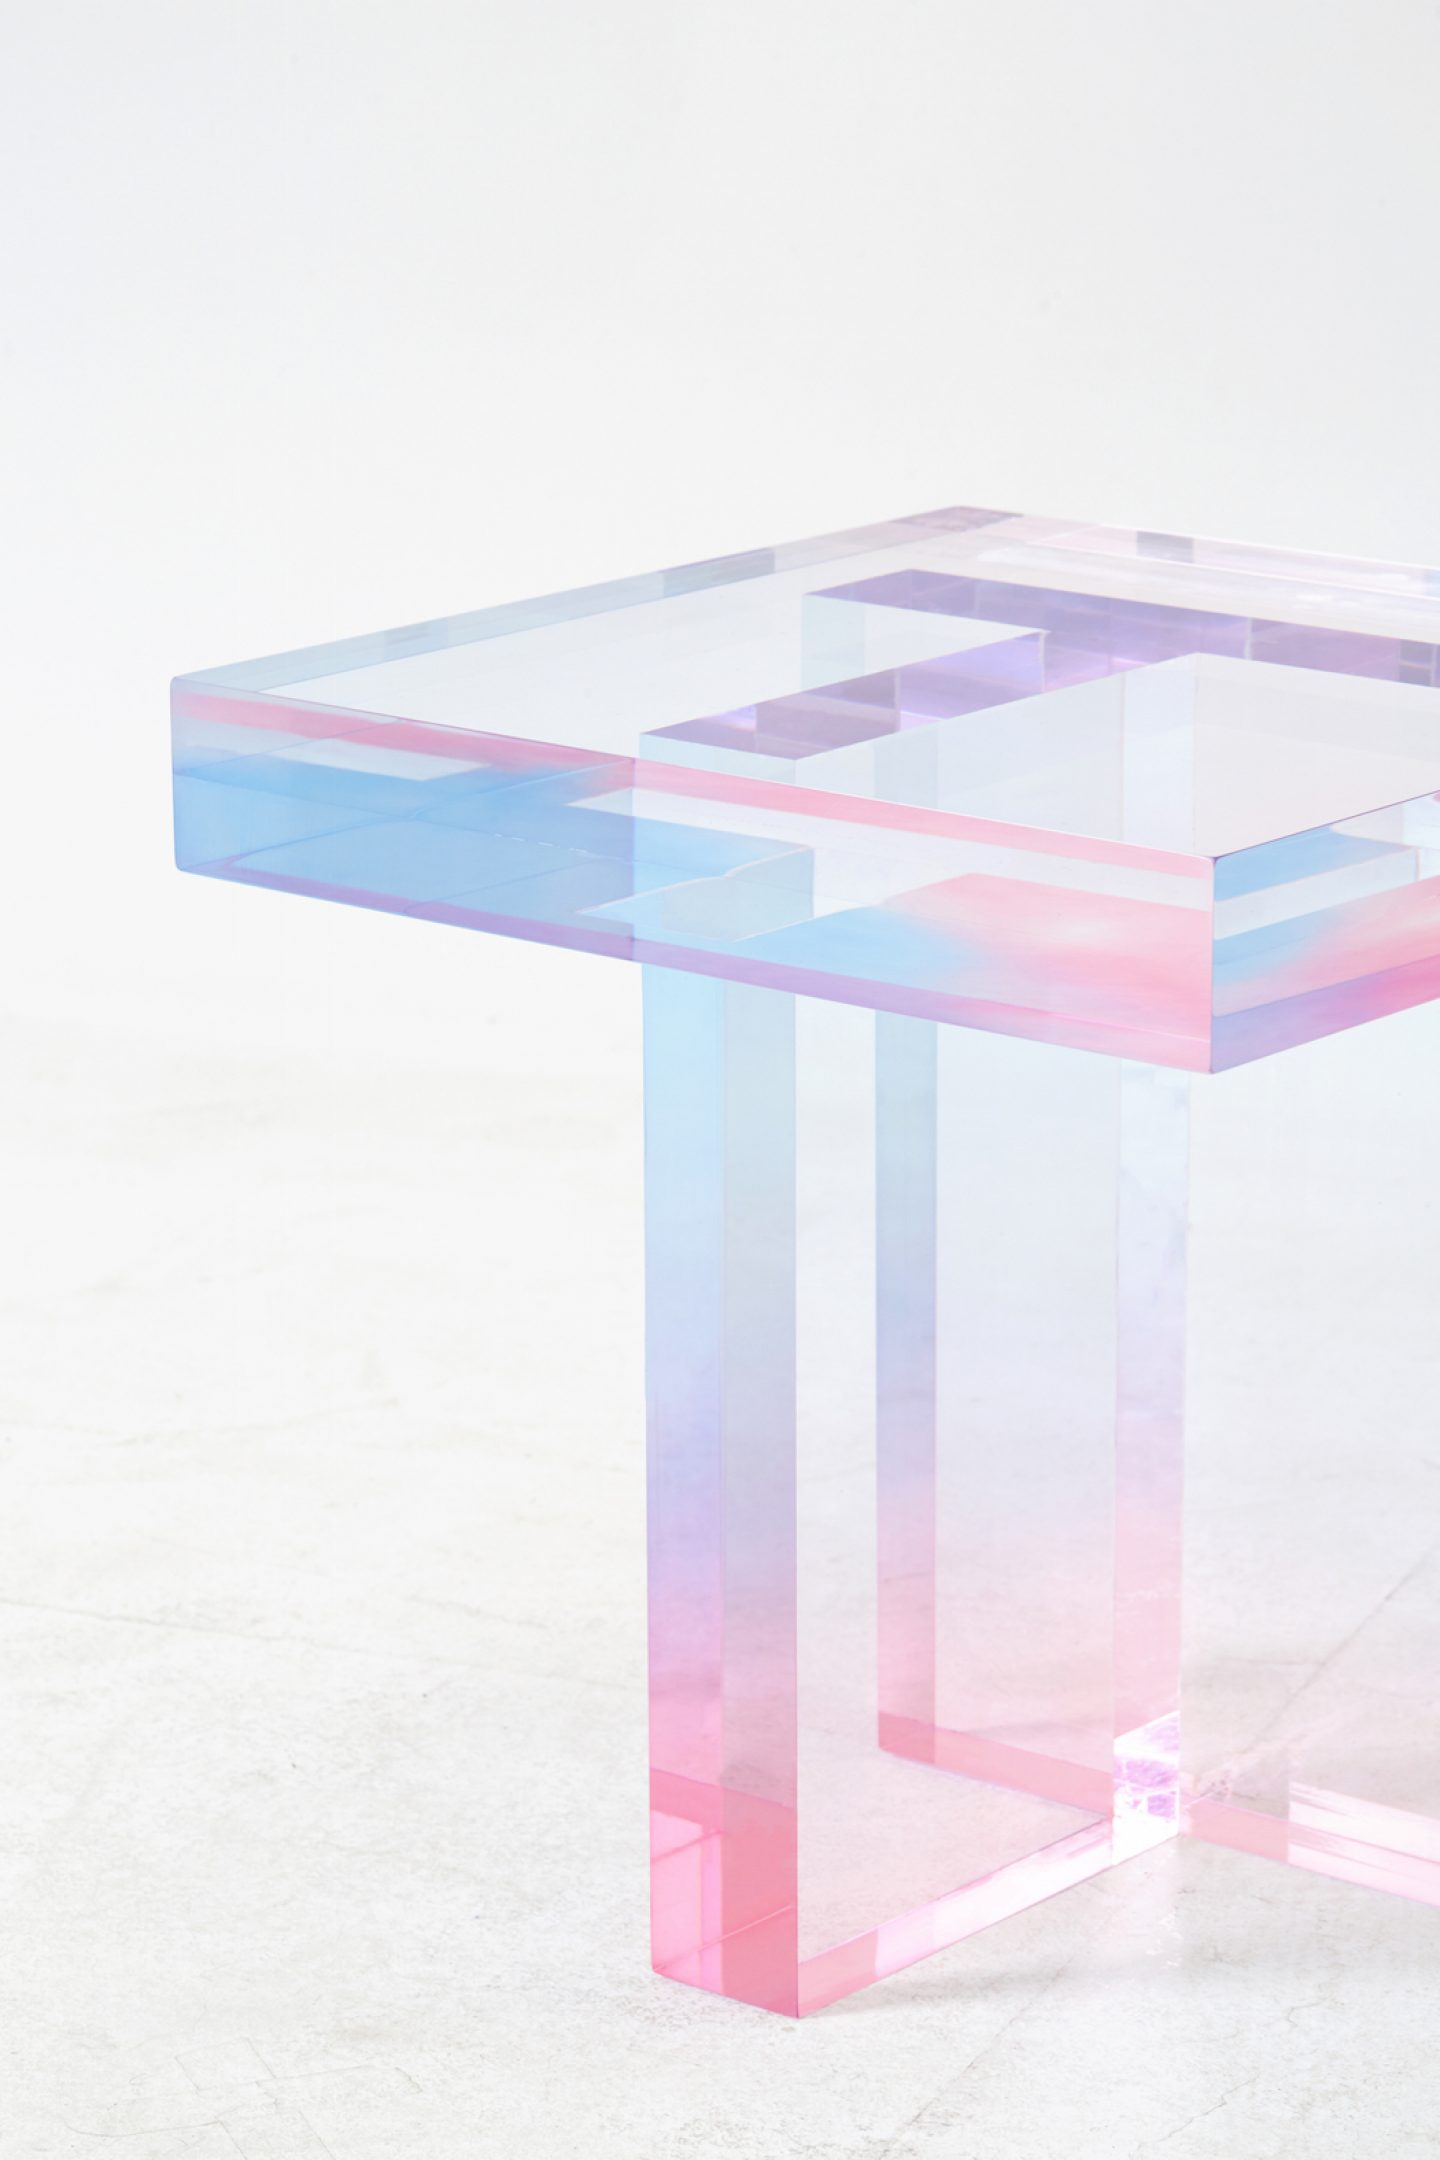 Saerom_Yoon_Design_ 2-3